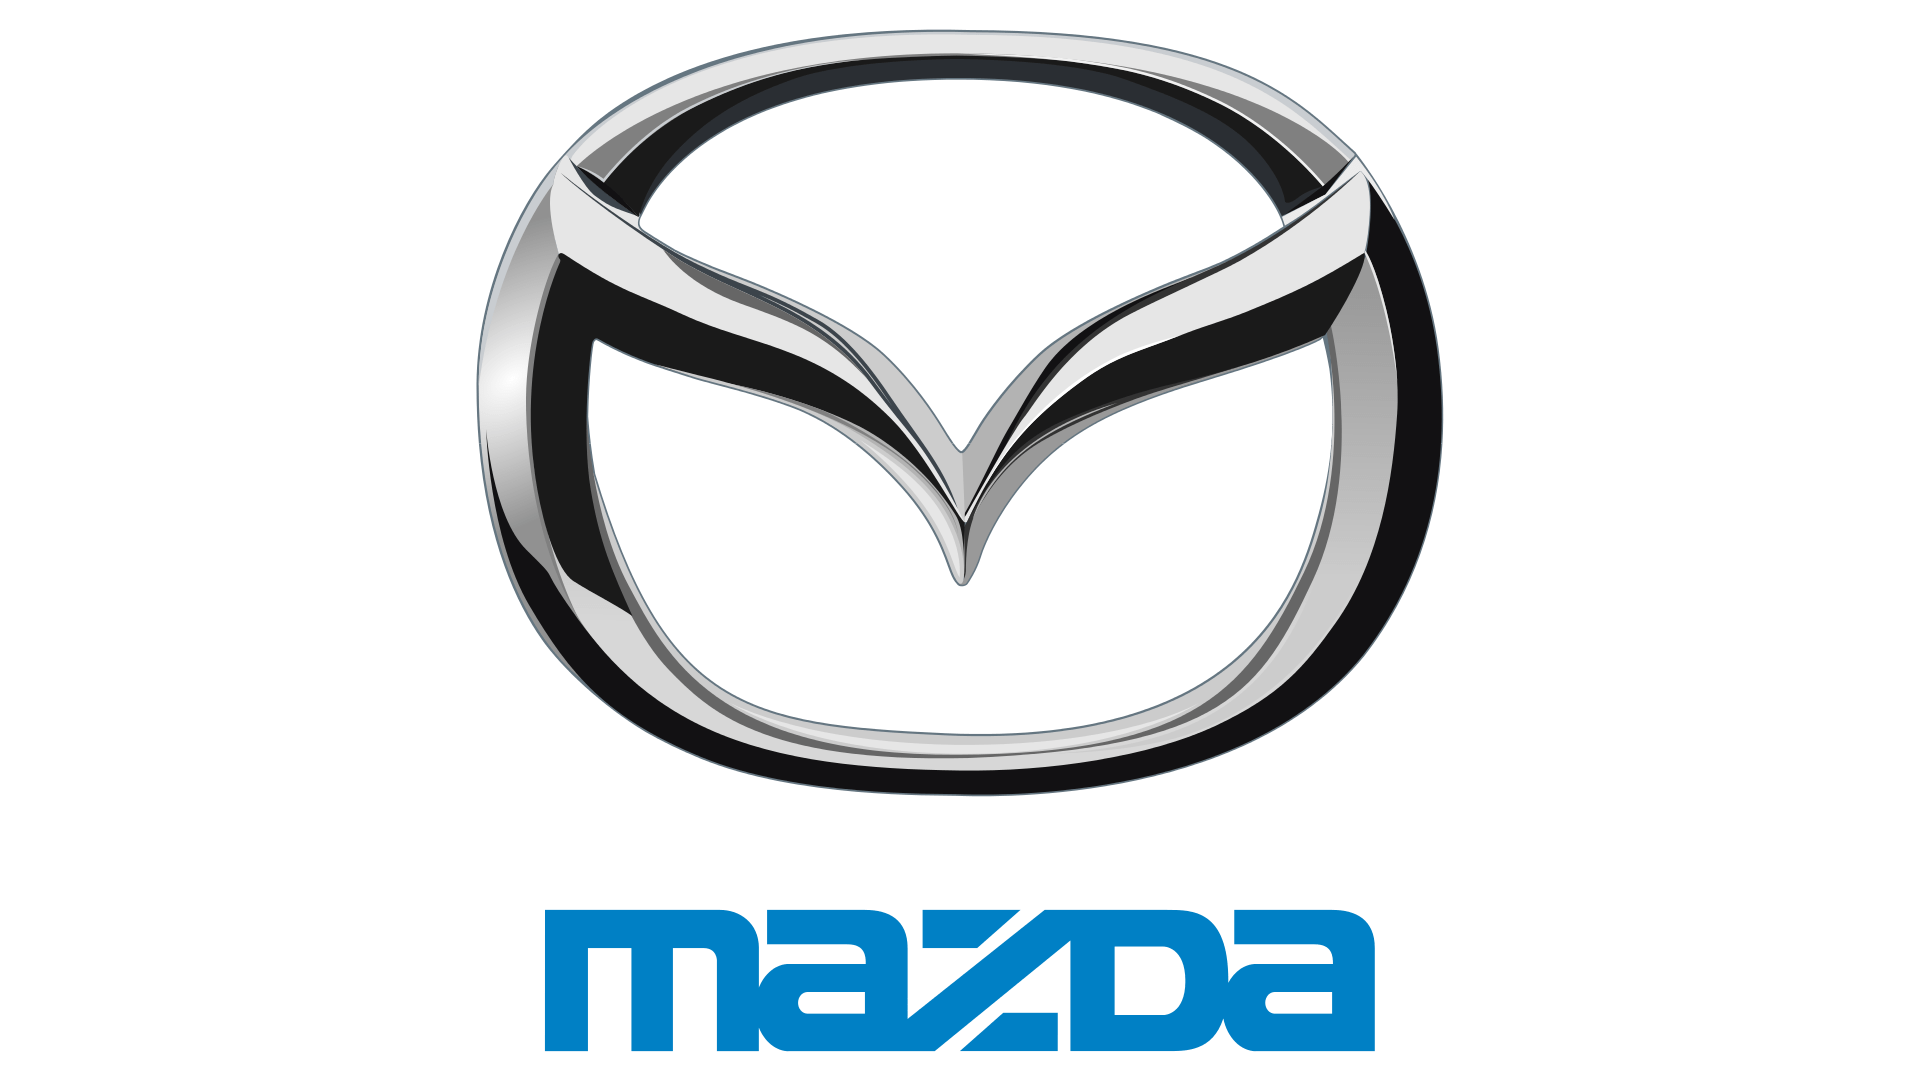 Mazda - get a car loan from carloans.credit